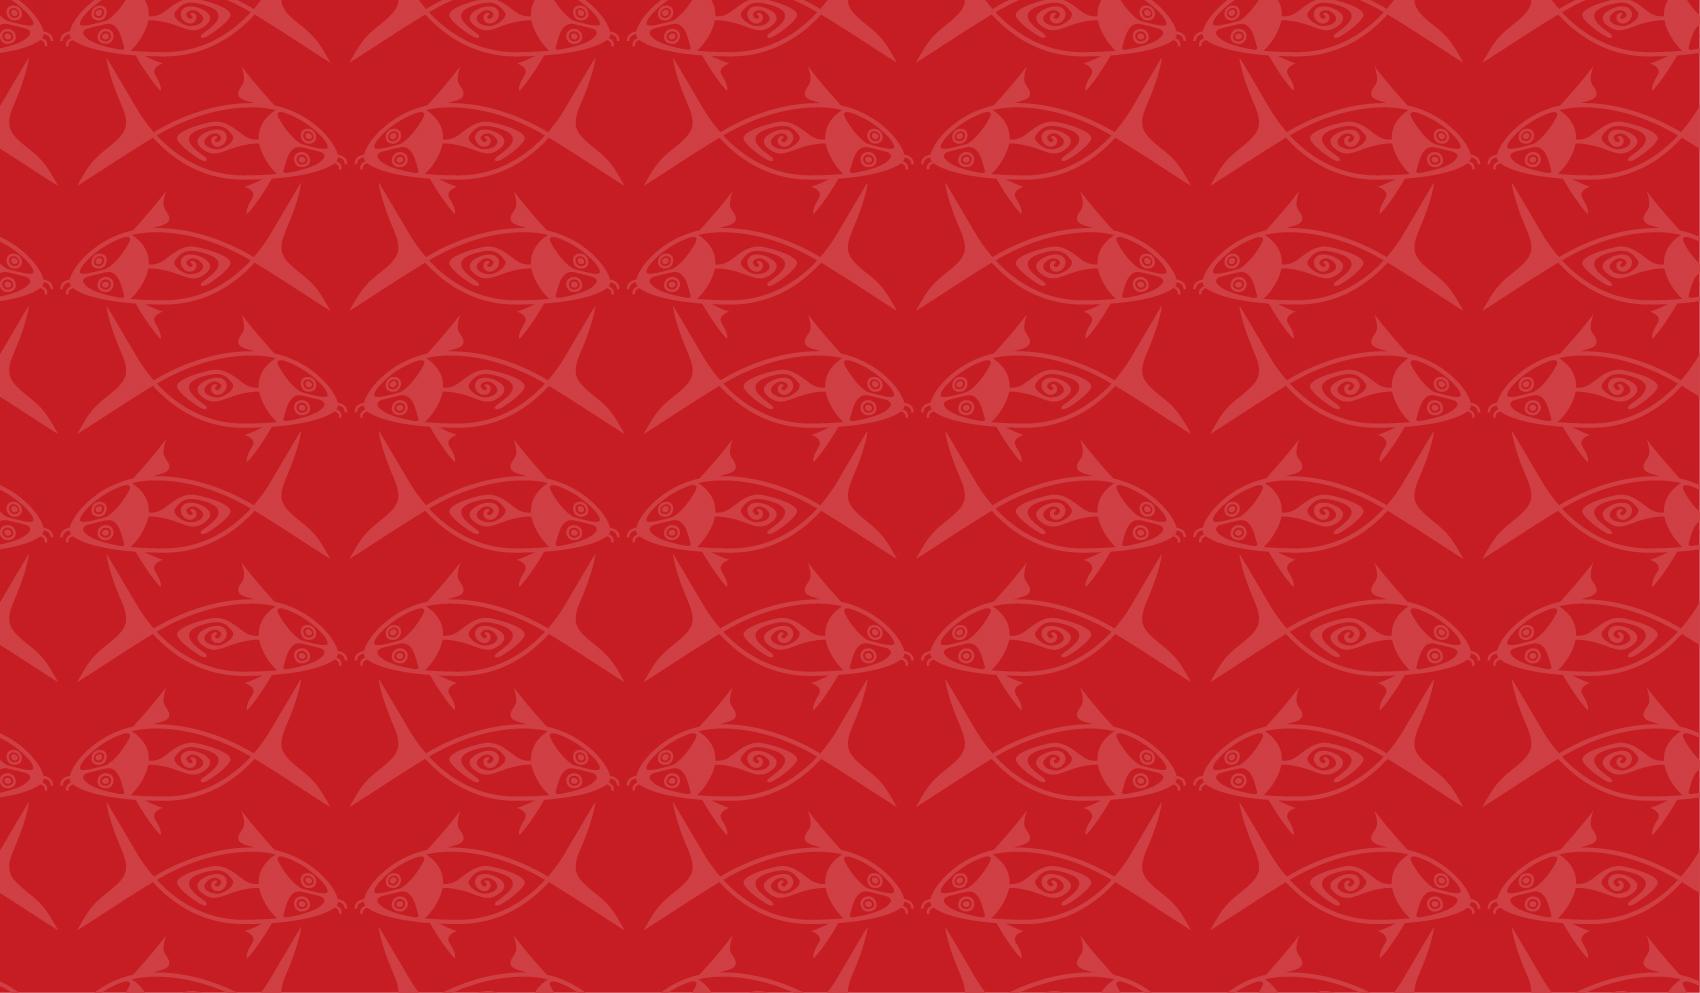 Red background illustrations for Biodiversity Raja Ampat